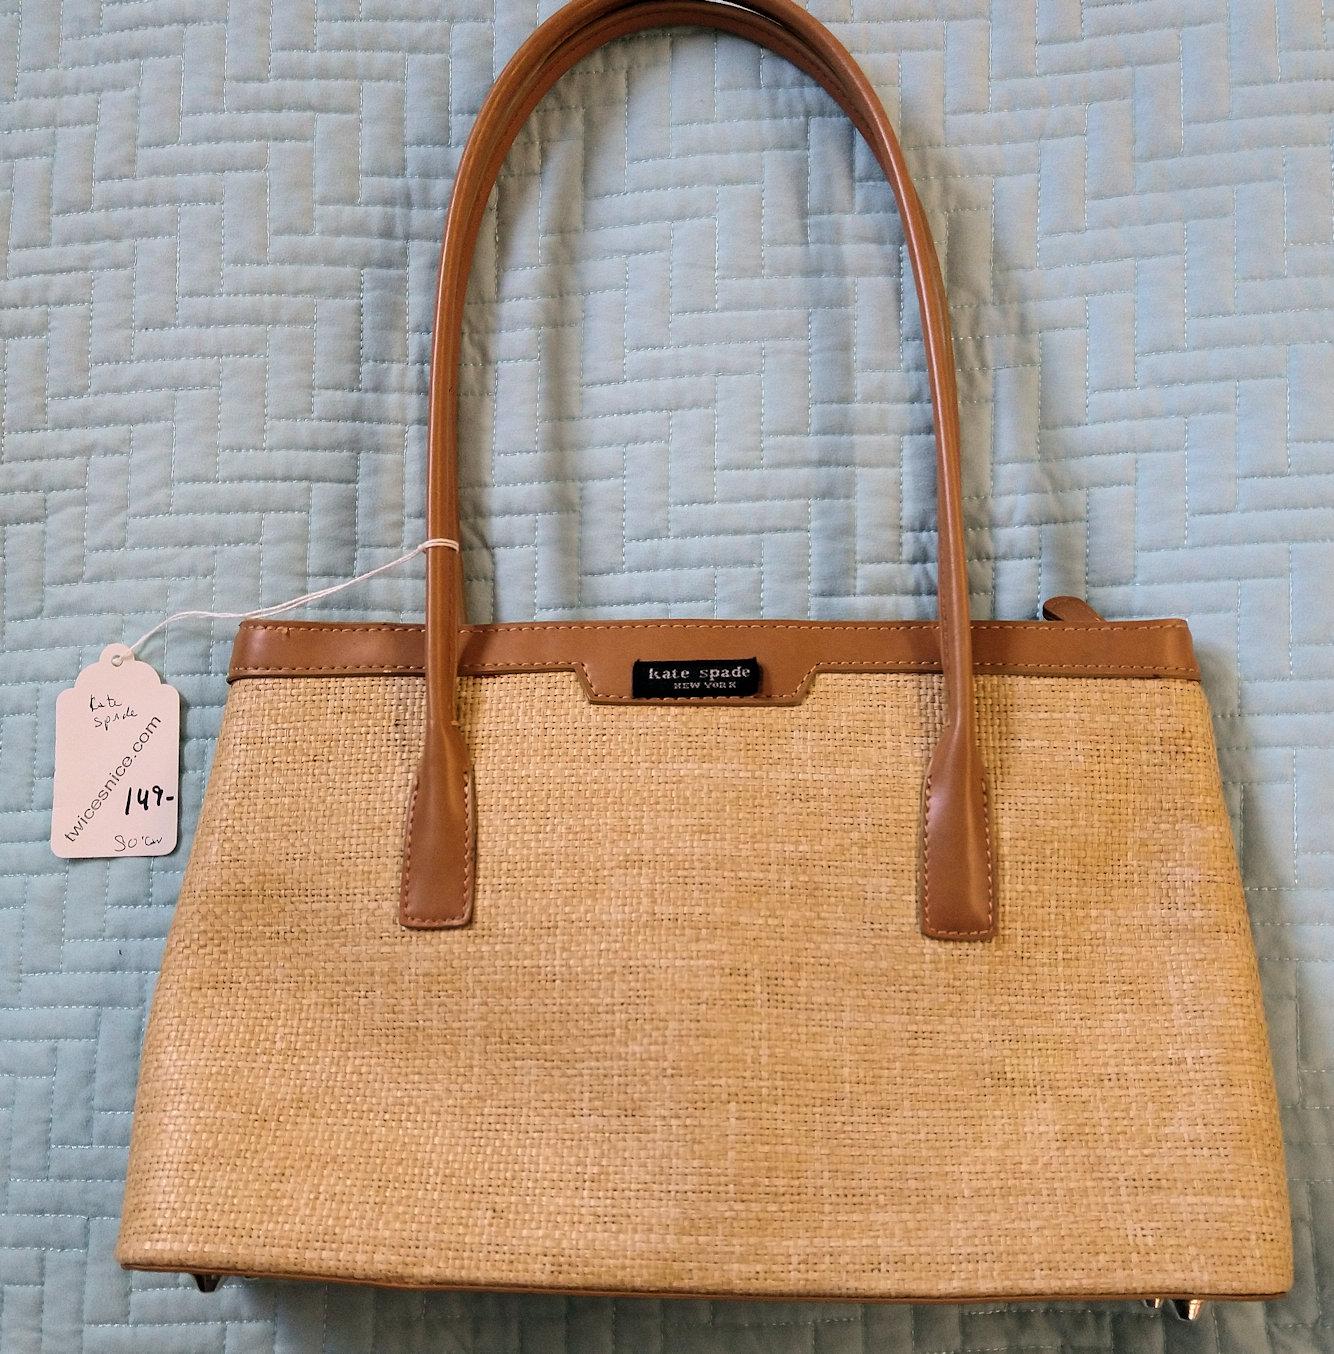 KK0180-Kate-Spade-purse